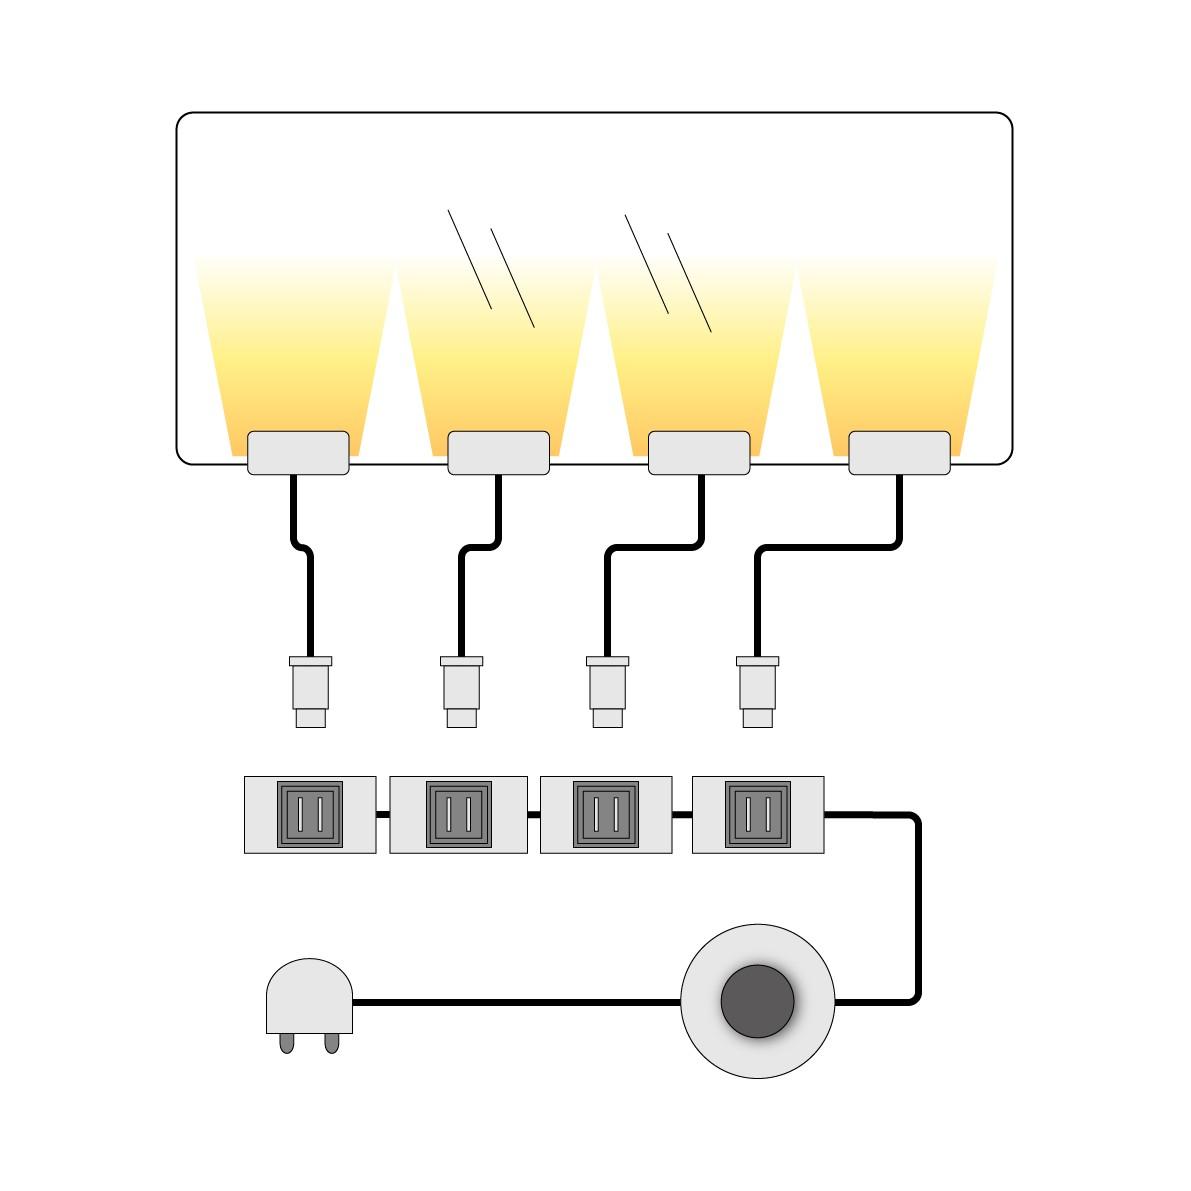 LED-Glaskantenbeleuchtung Farisita